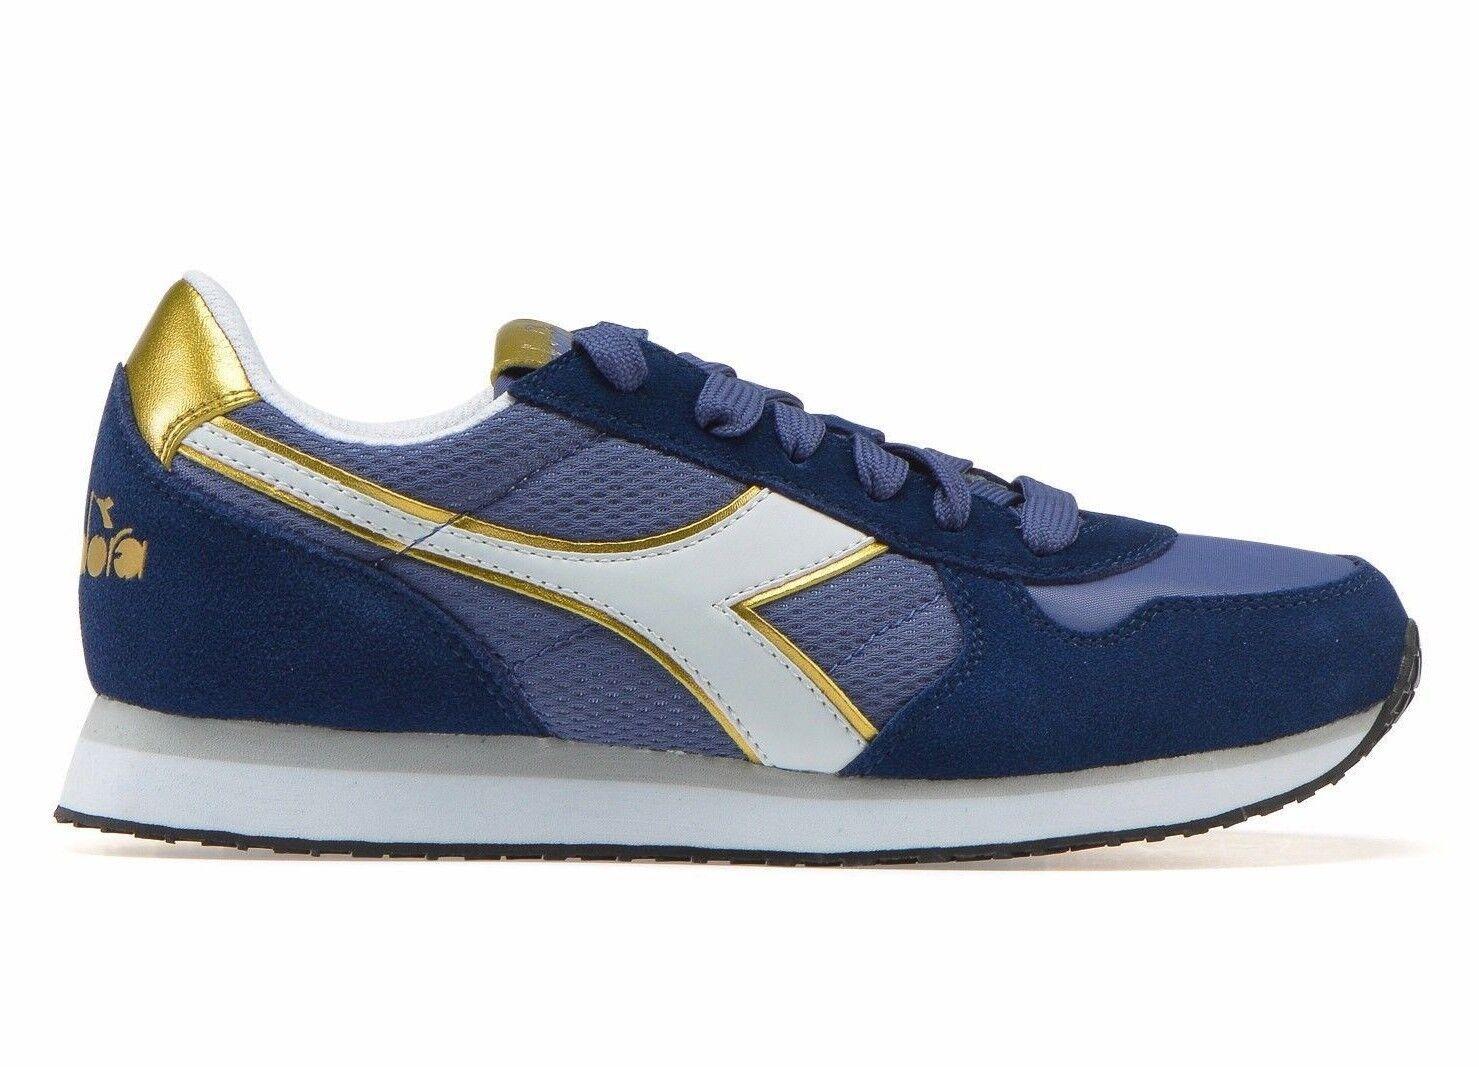 DIADORA 173068-55271 K-RUN W Wmn's (M) Marlin Nylon Suede Lifestyle shoes